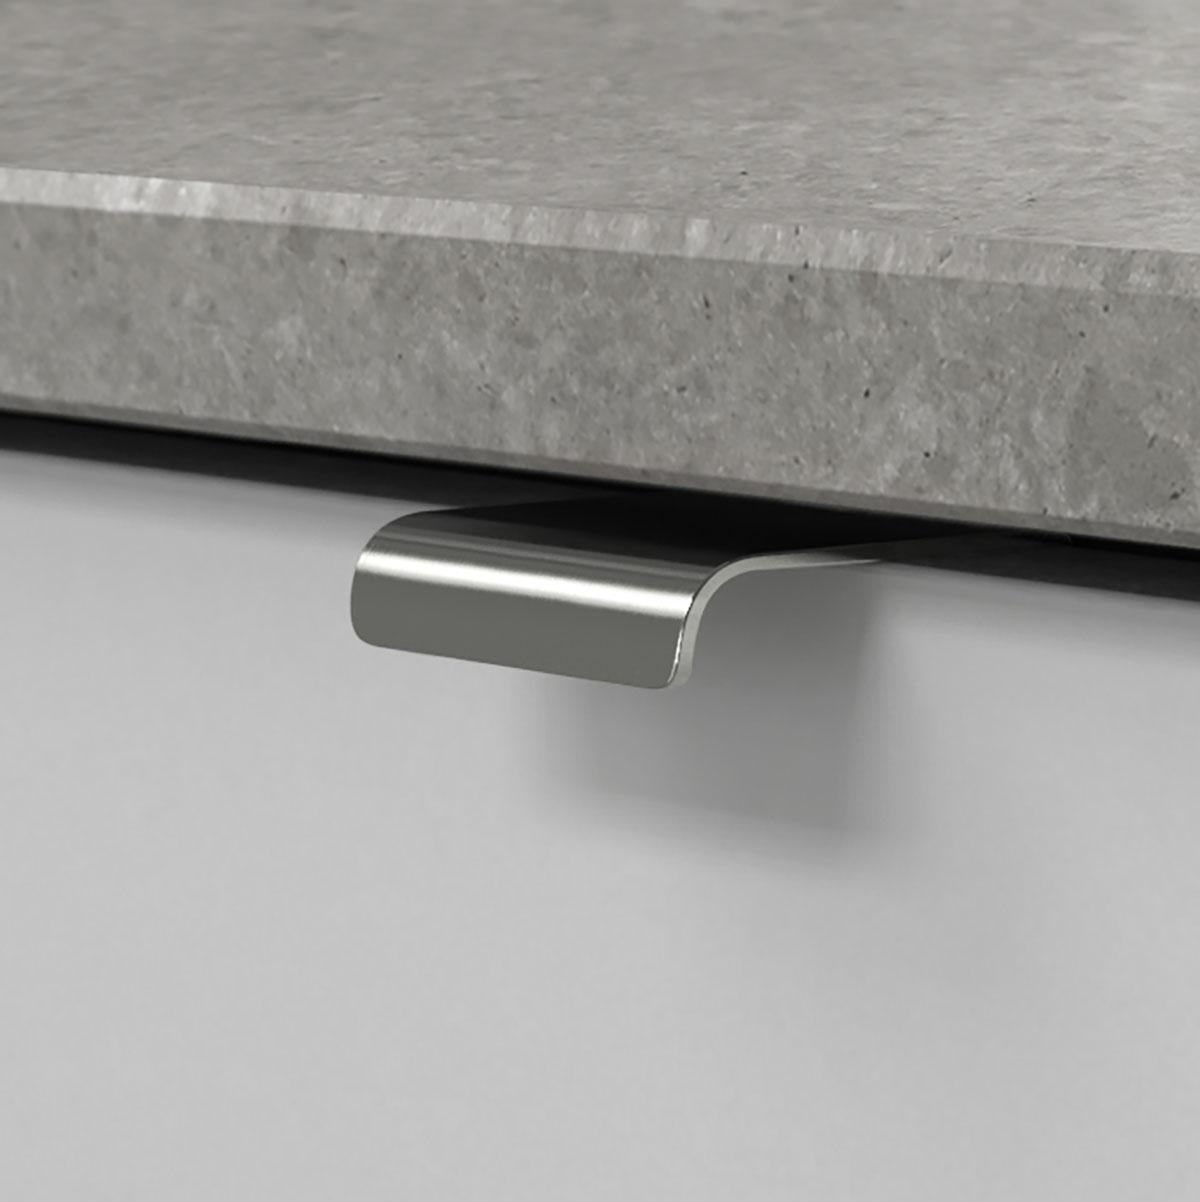 Profilhandtag lip krom 343453 11 40 mm ncs s 3000 n noble concrete grey